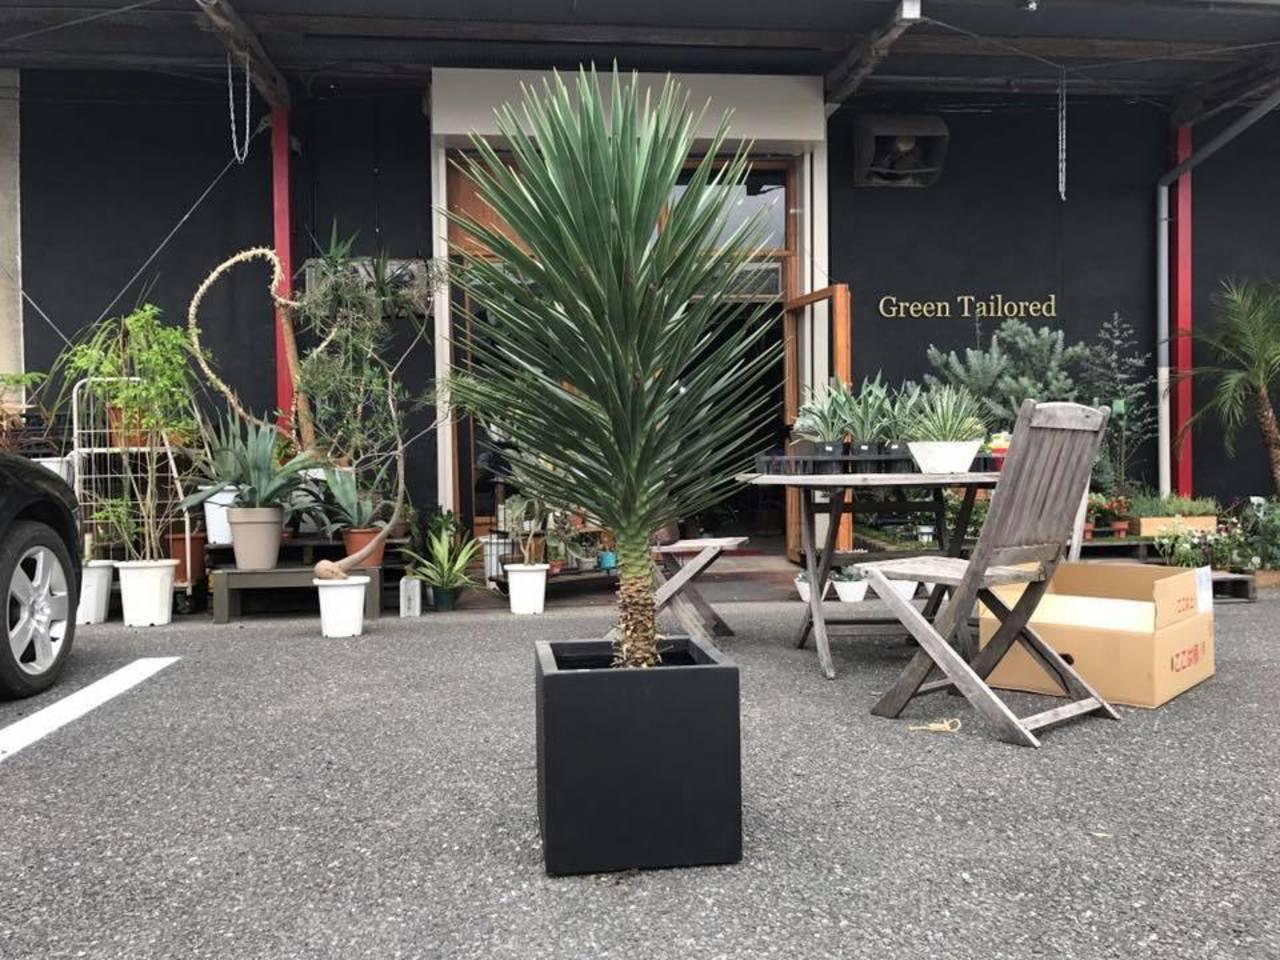 【 Green Tailored 】植物と雑貨(群馬県館林市)